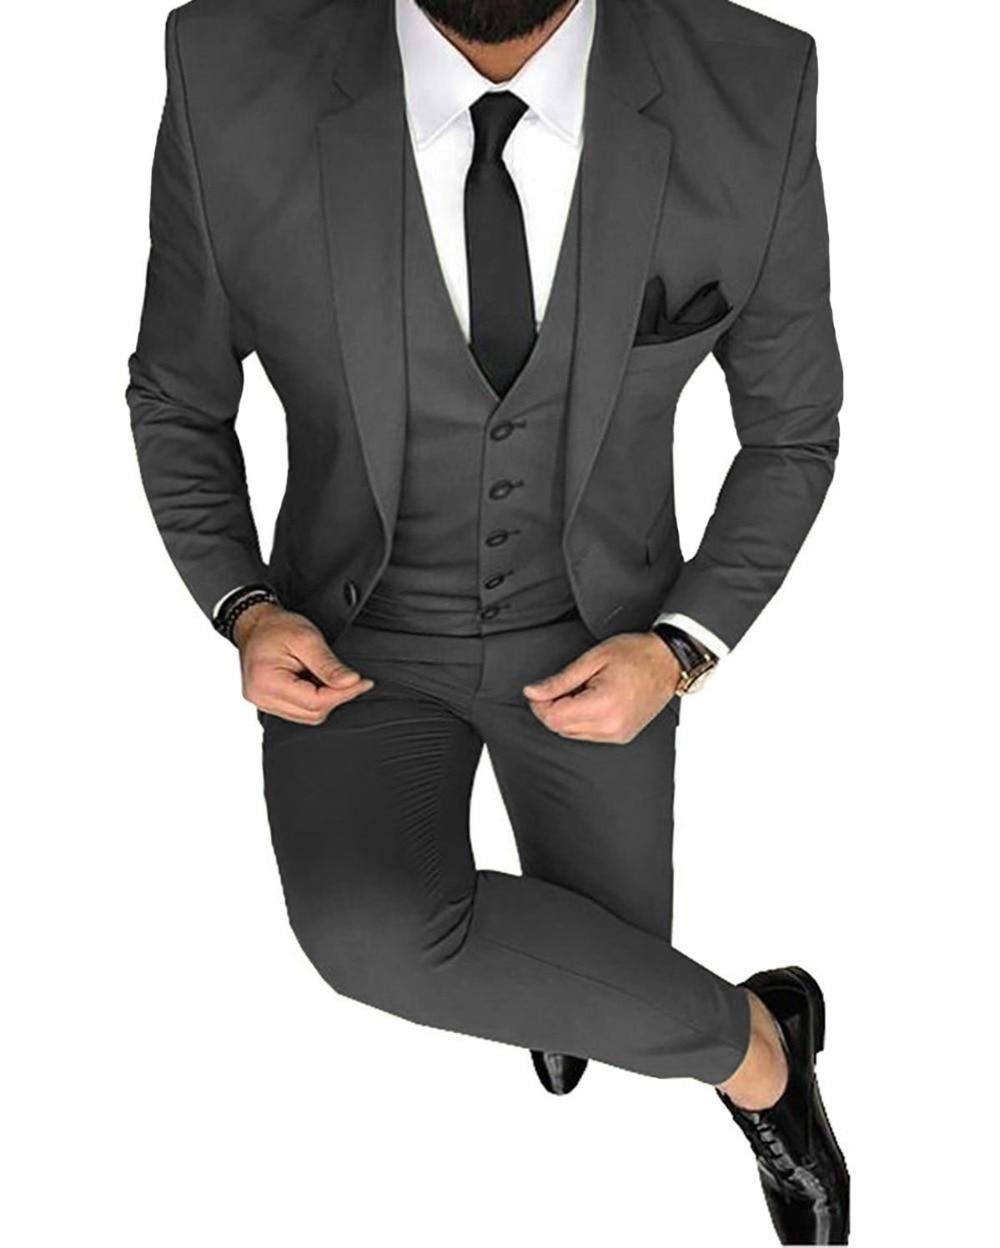 Blazer+Vest+Pant Mens 3 Piece Winter Men Suit Velvet Slim Fit Notch Lapel Formal Tuxedos for Groomsmen